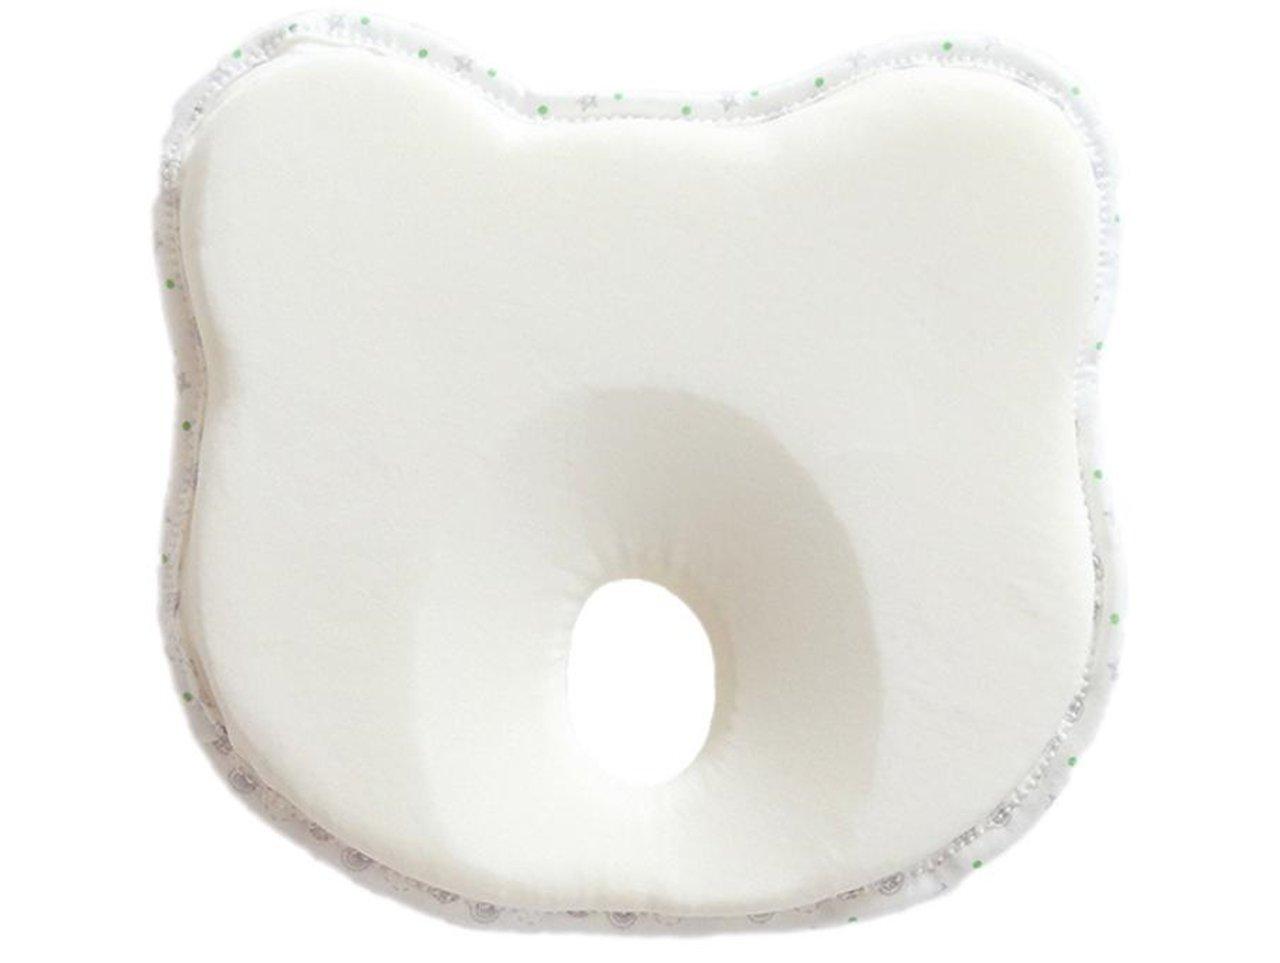 graffiti jp baby's pillow newborn infant breathabillty hygienical antibacterial cotton bear shape (White)